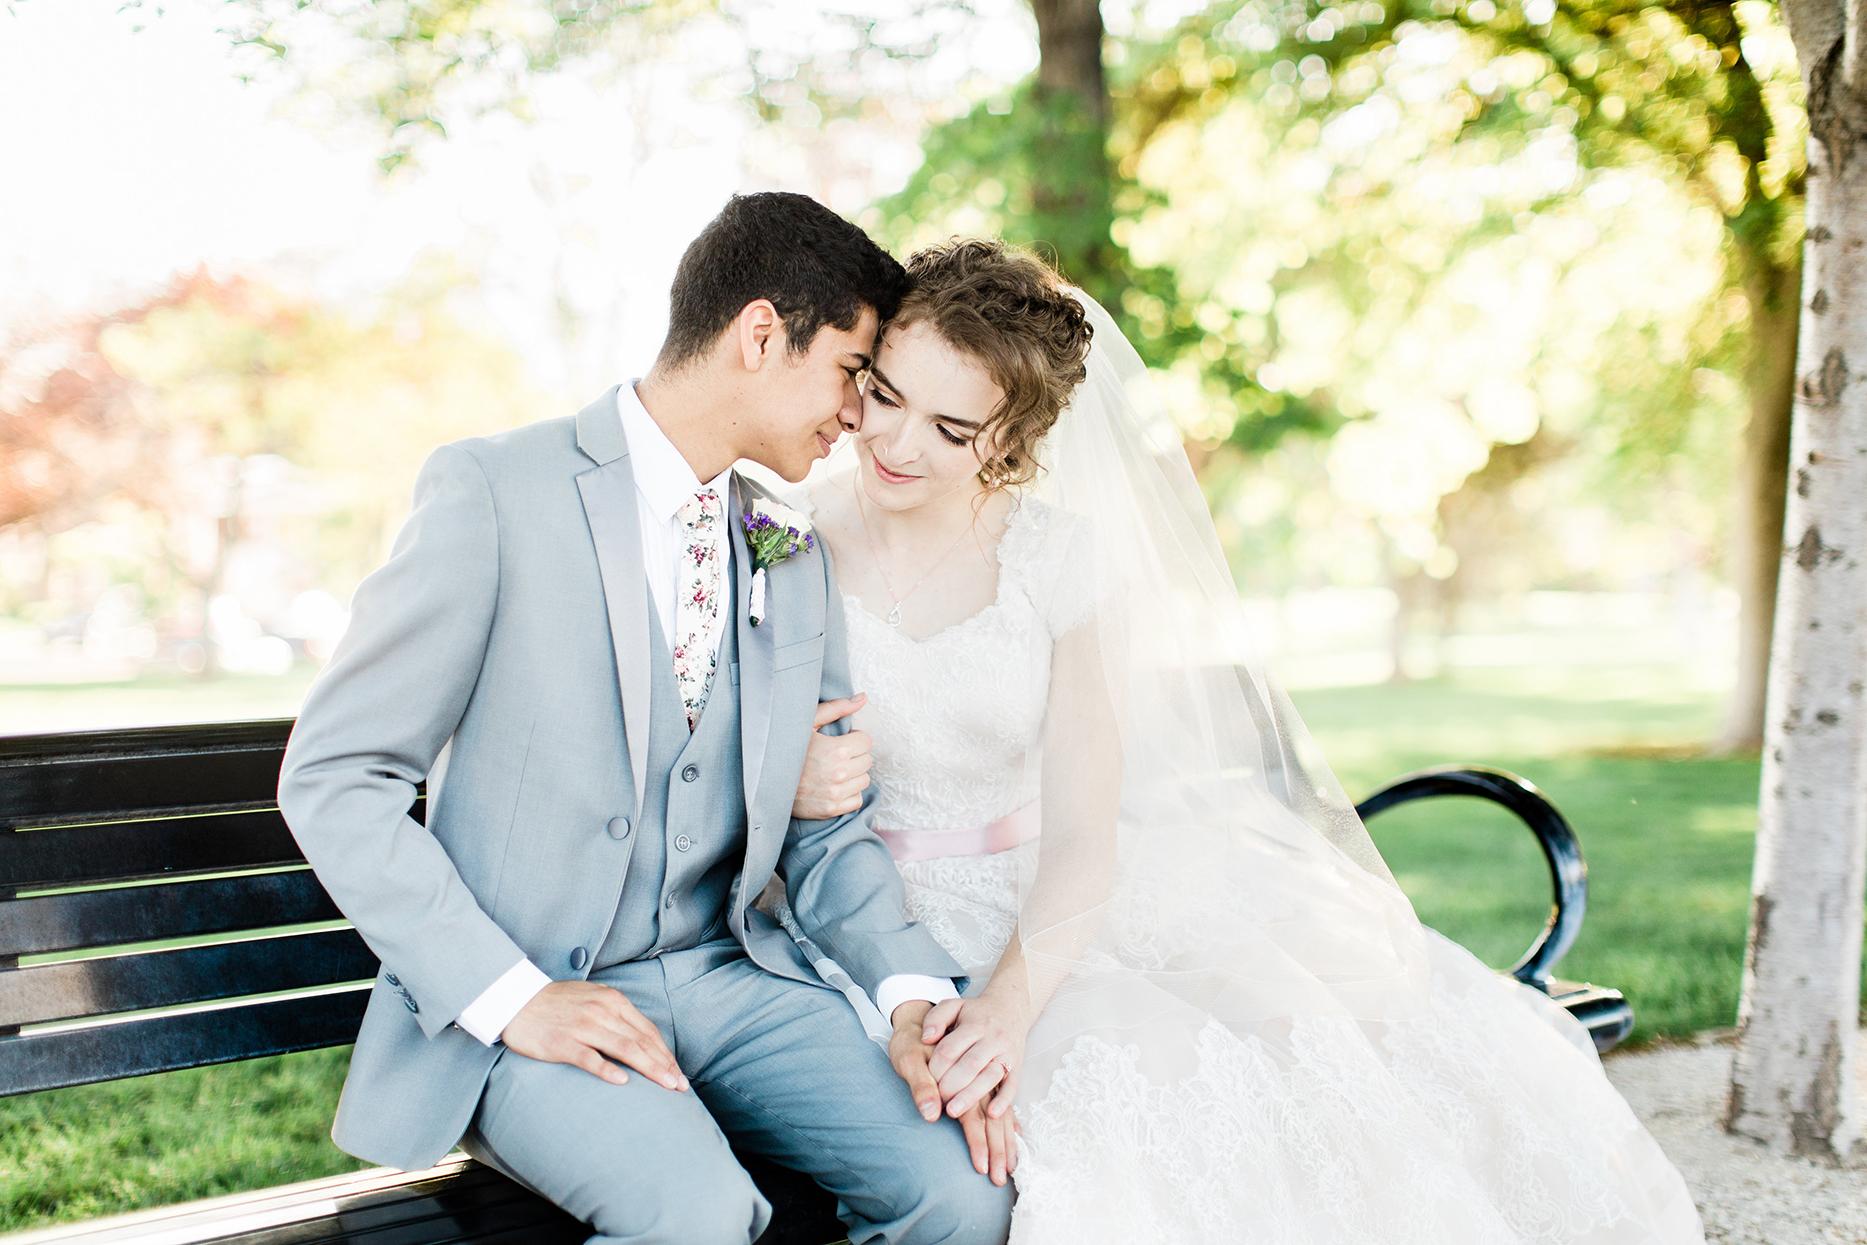 Kevin Kieran Bridals Part 2 May 8 2018-print 2-0054.jpg